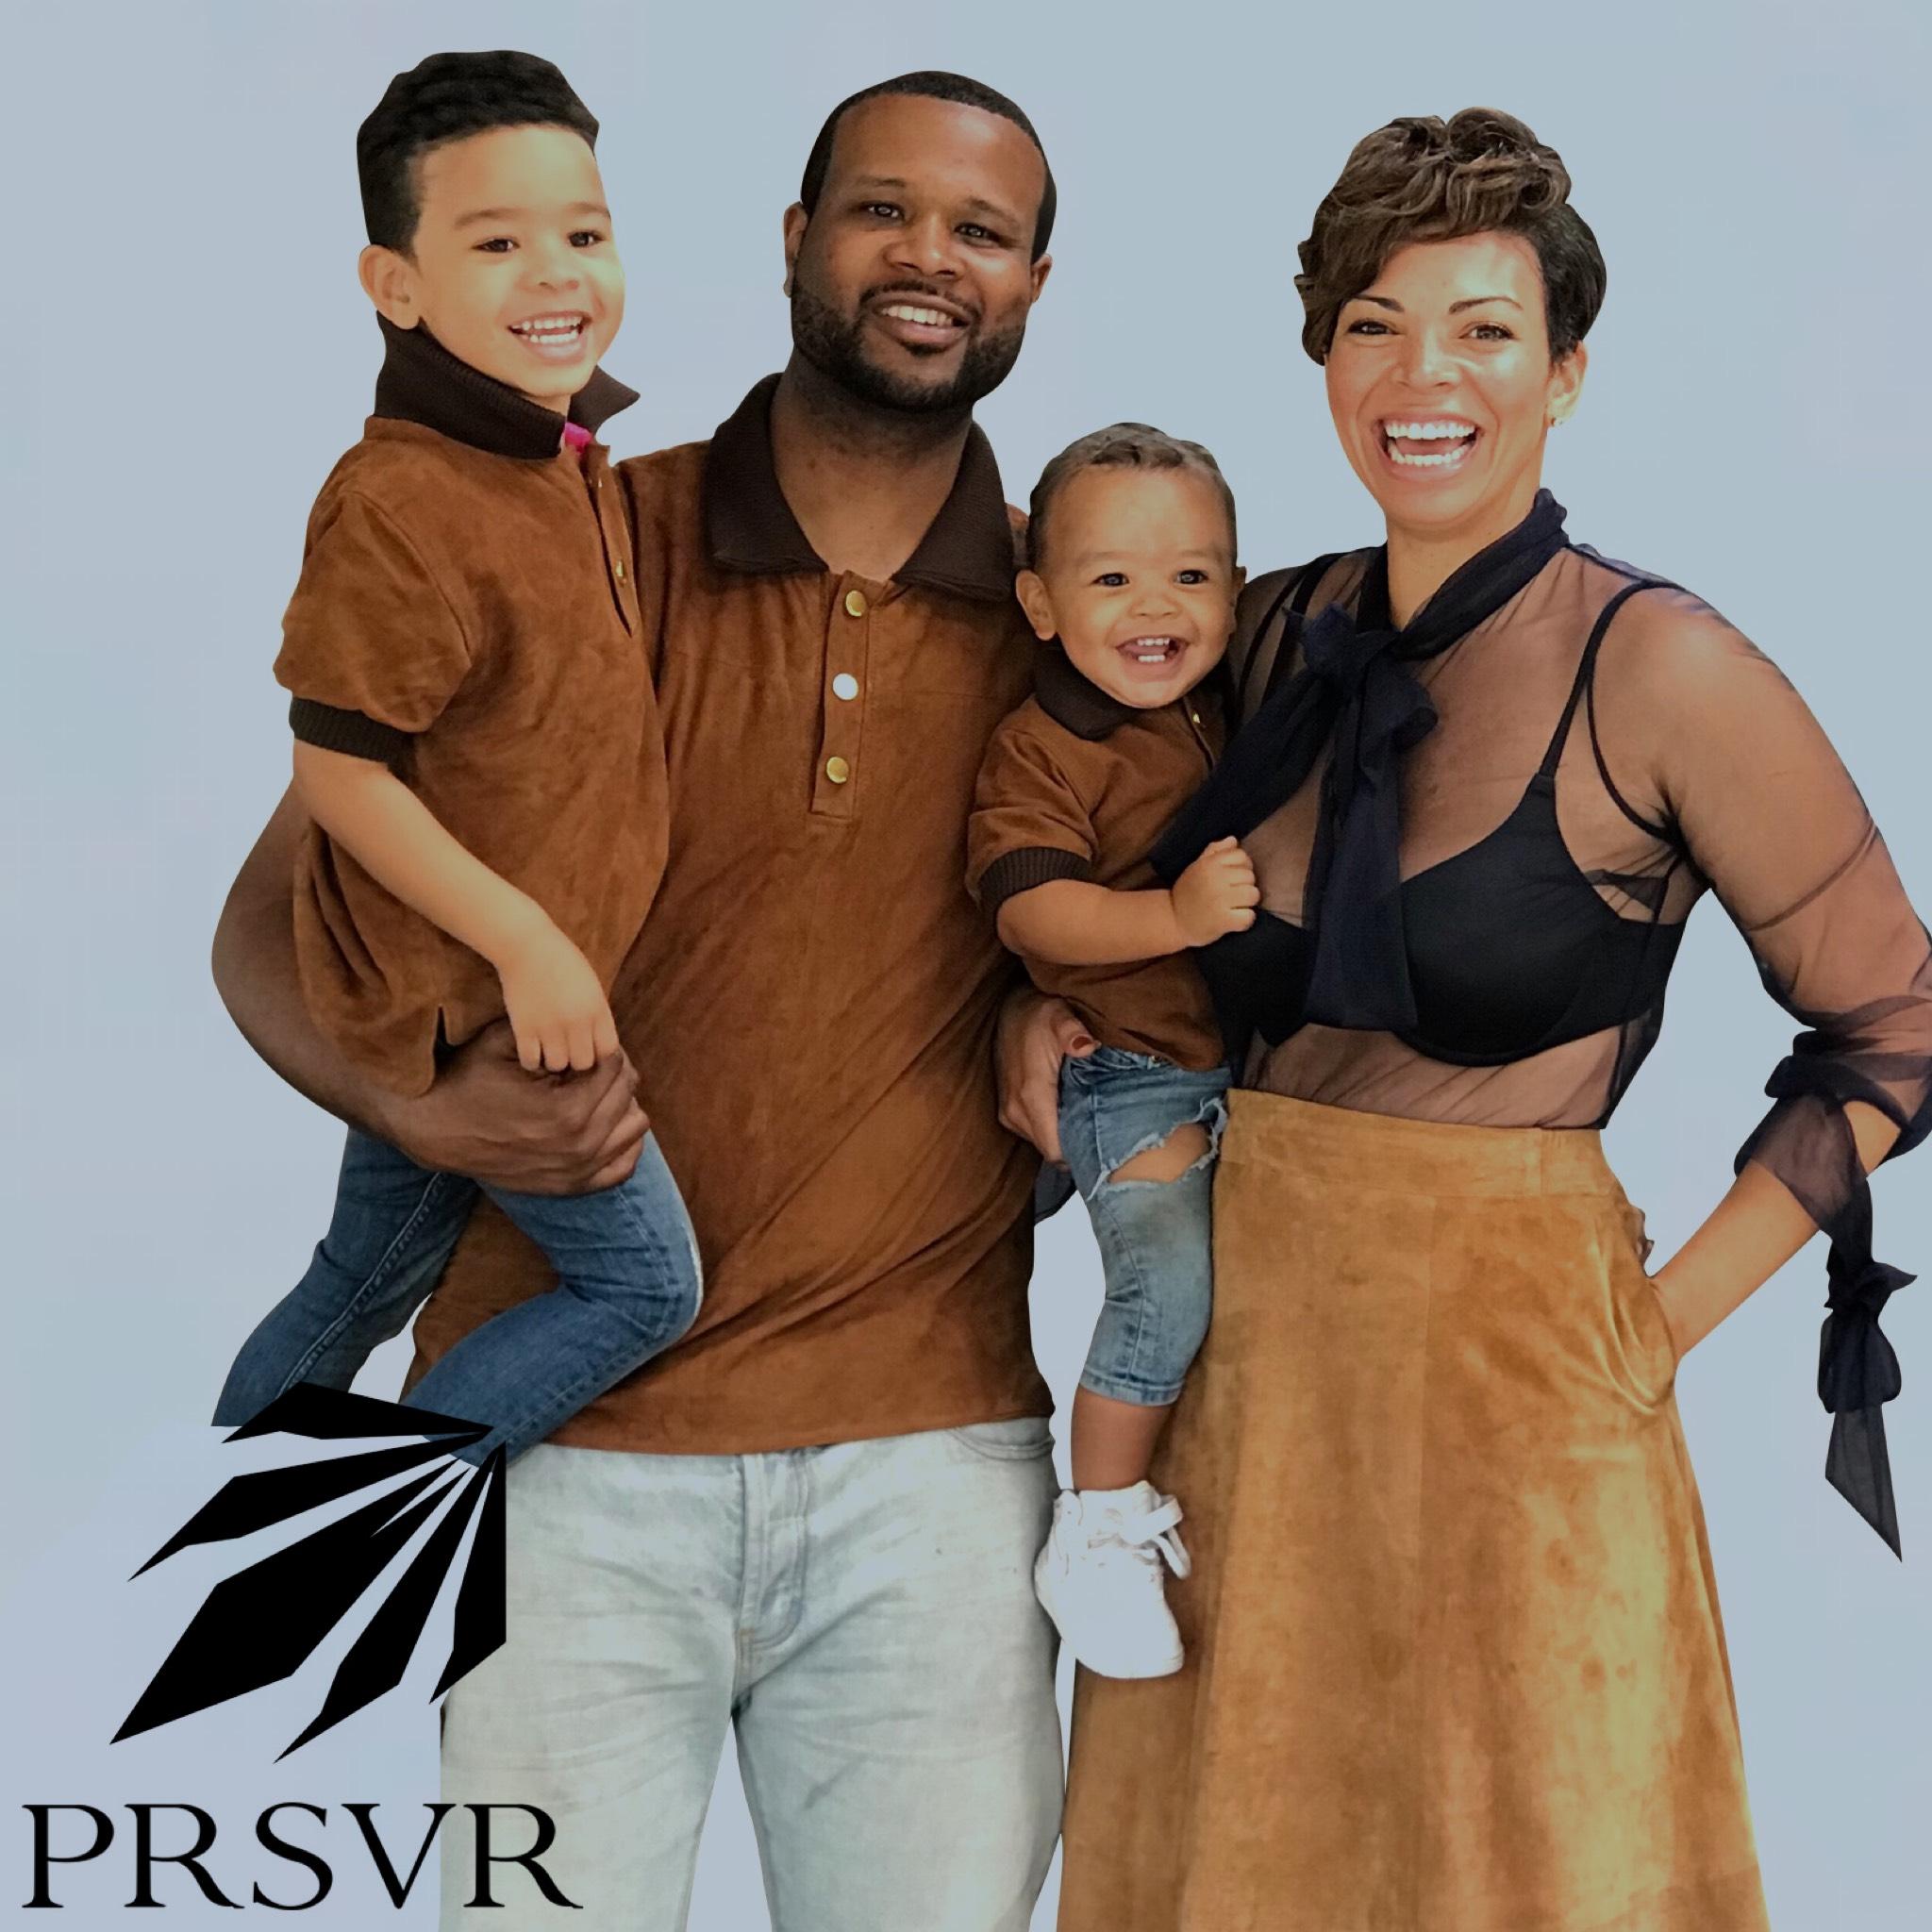 PRSVR | Lifestyle Brand